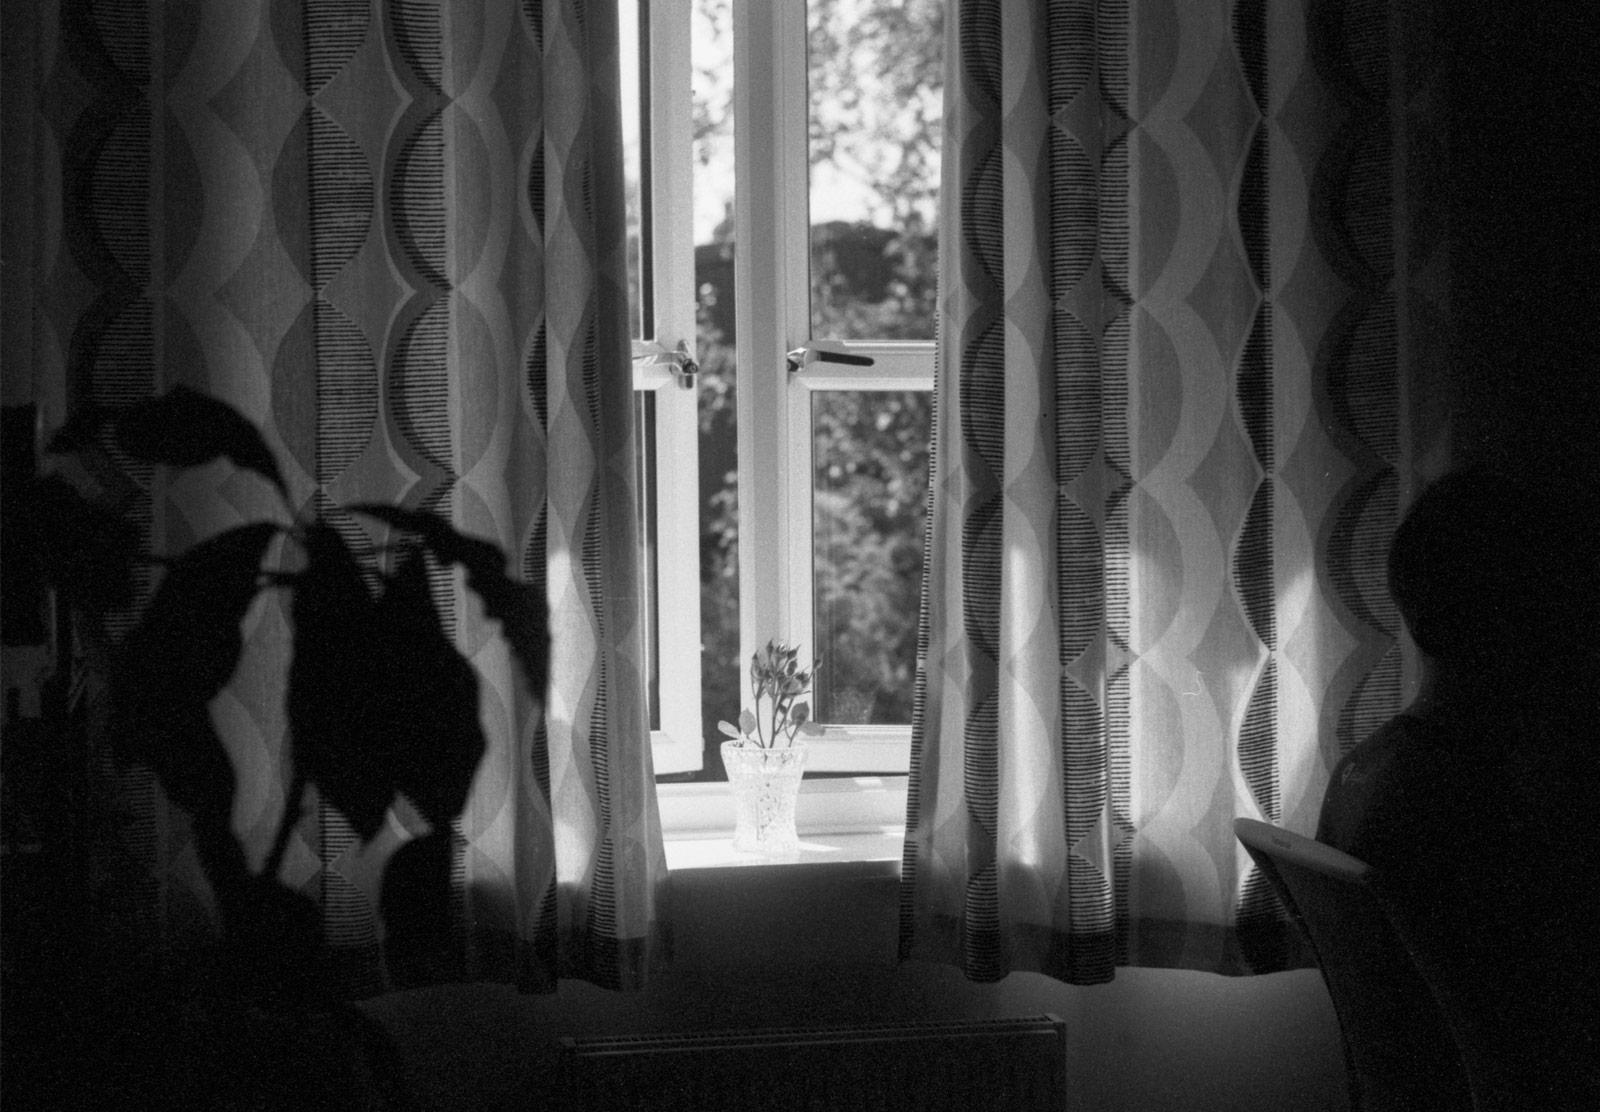 Curtains against window